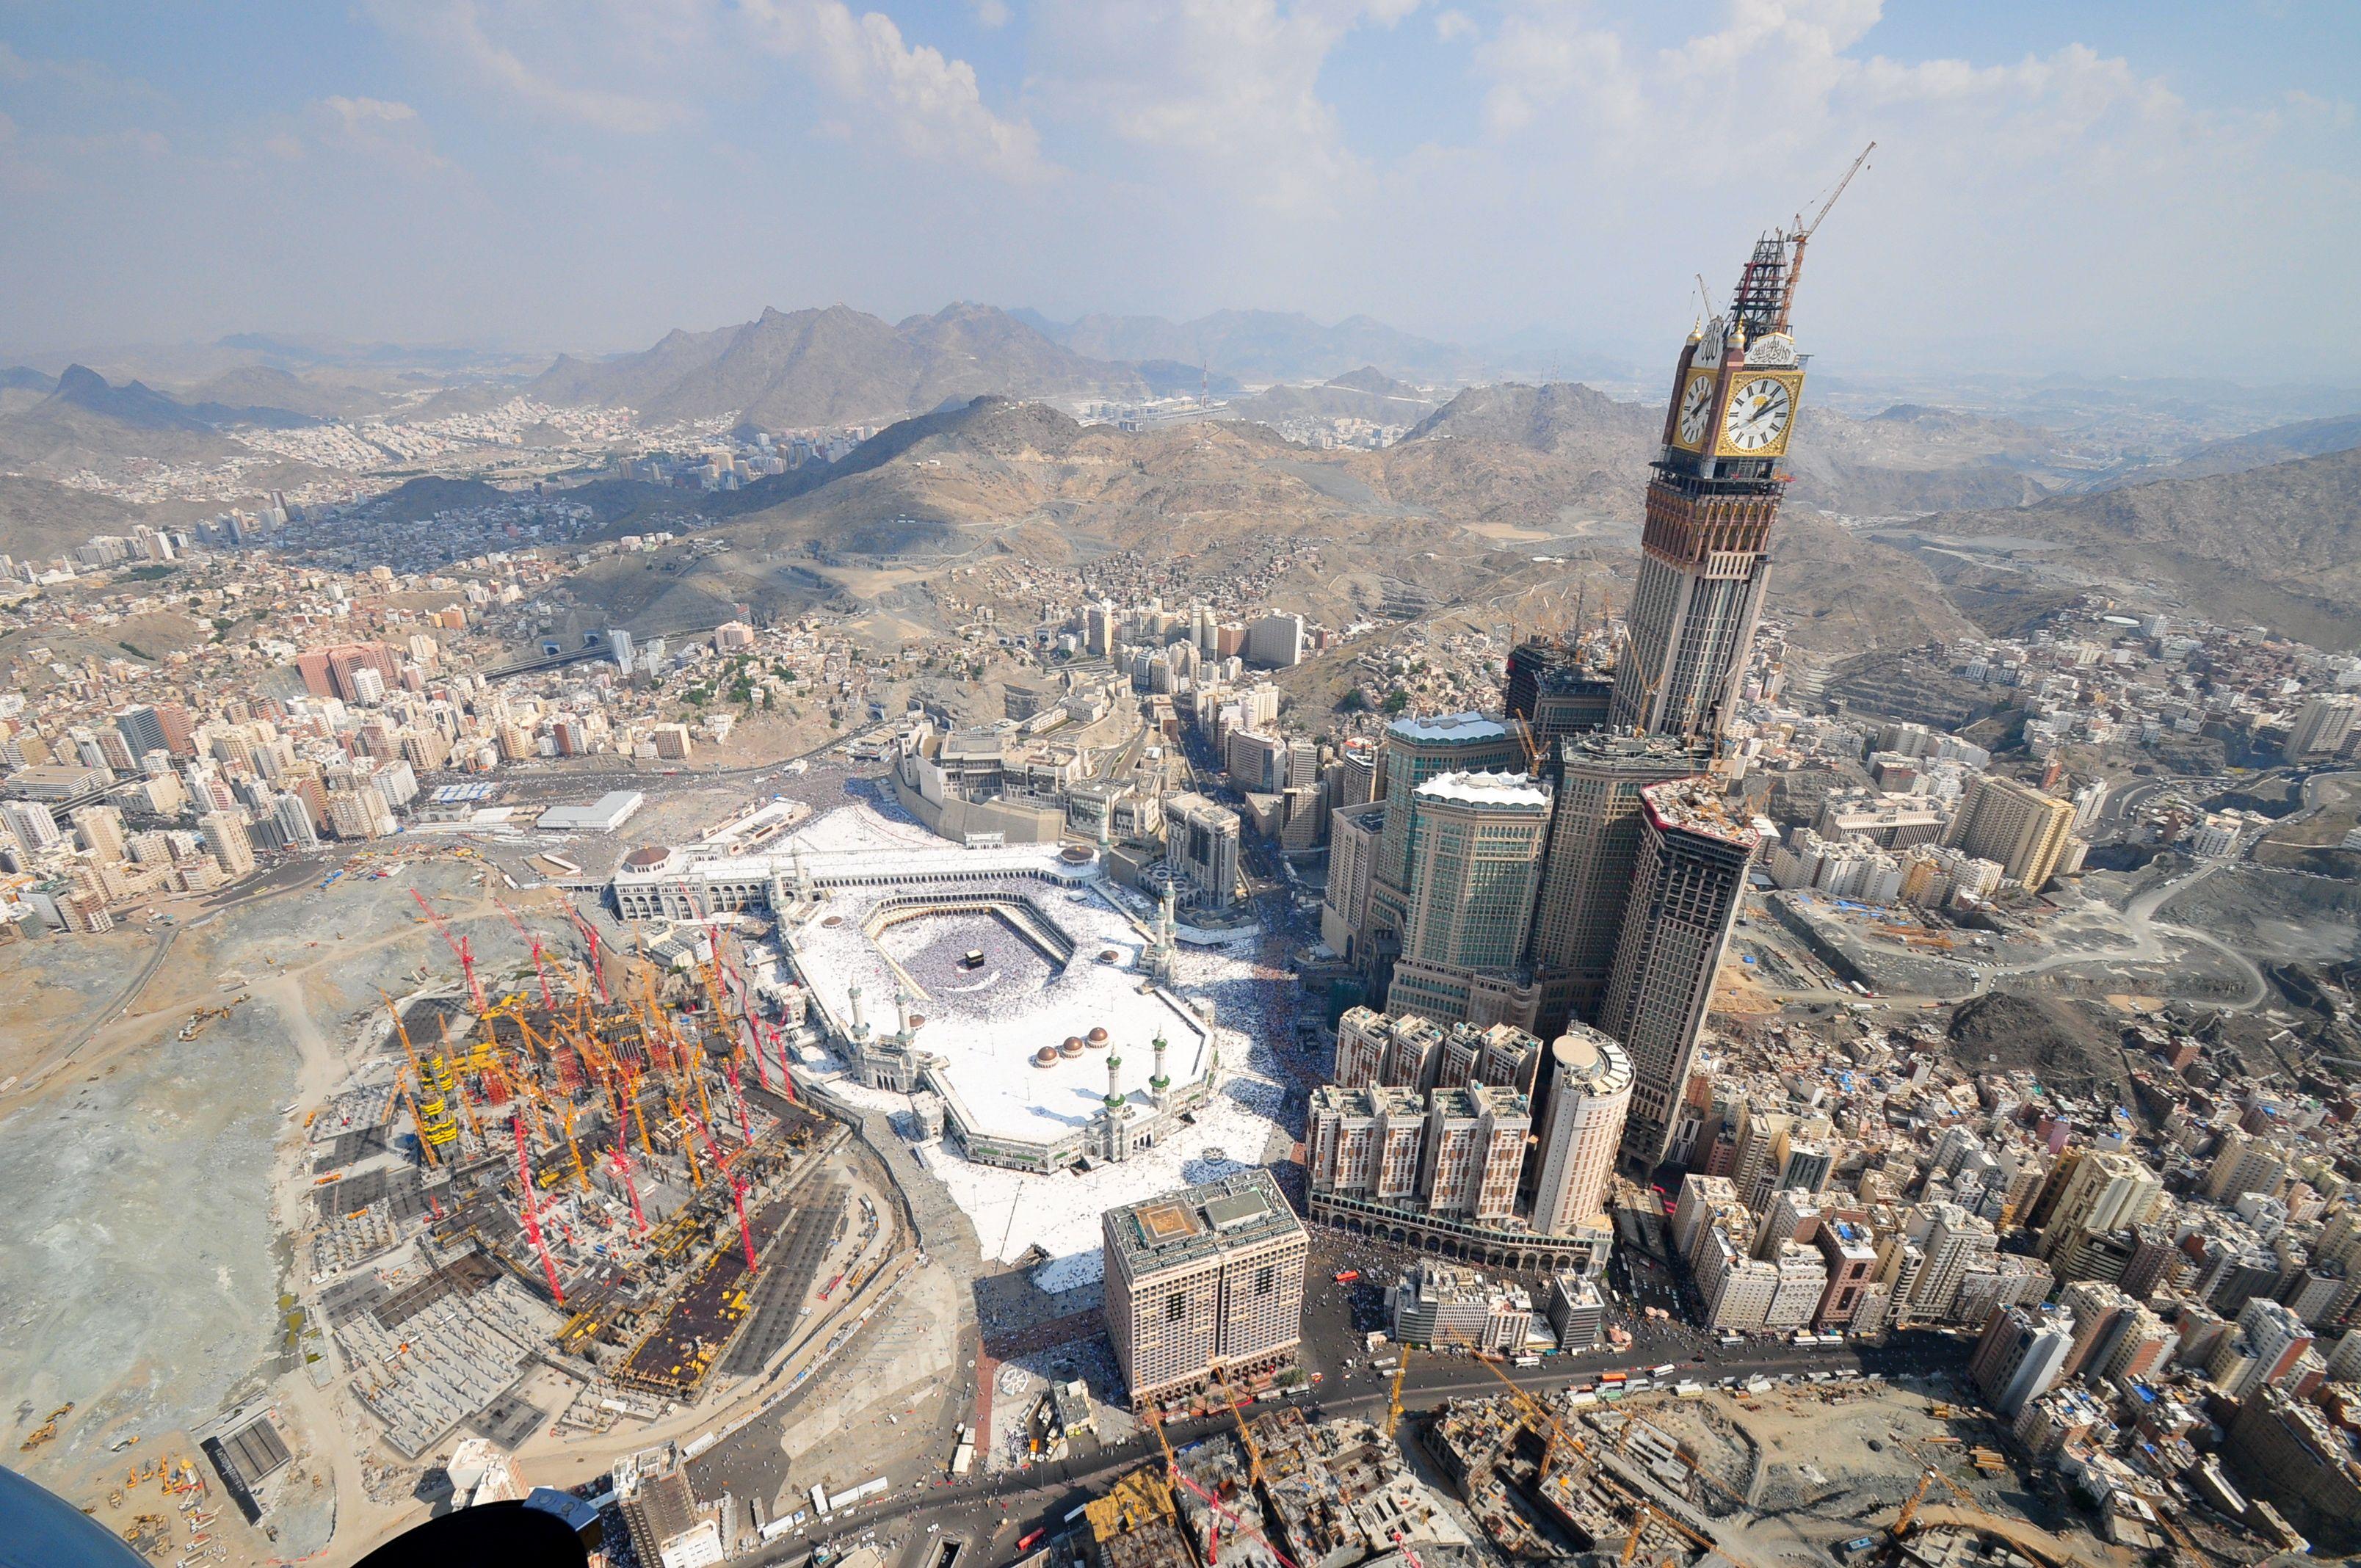 makkah clock royal tower - Google Search | Project Atlantis ...